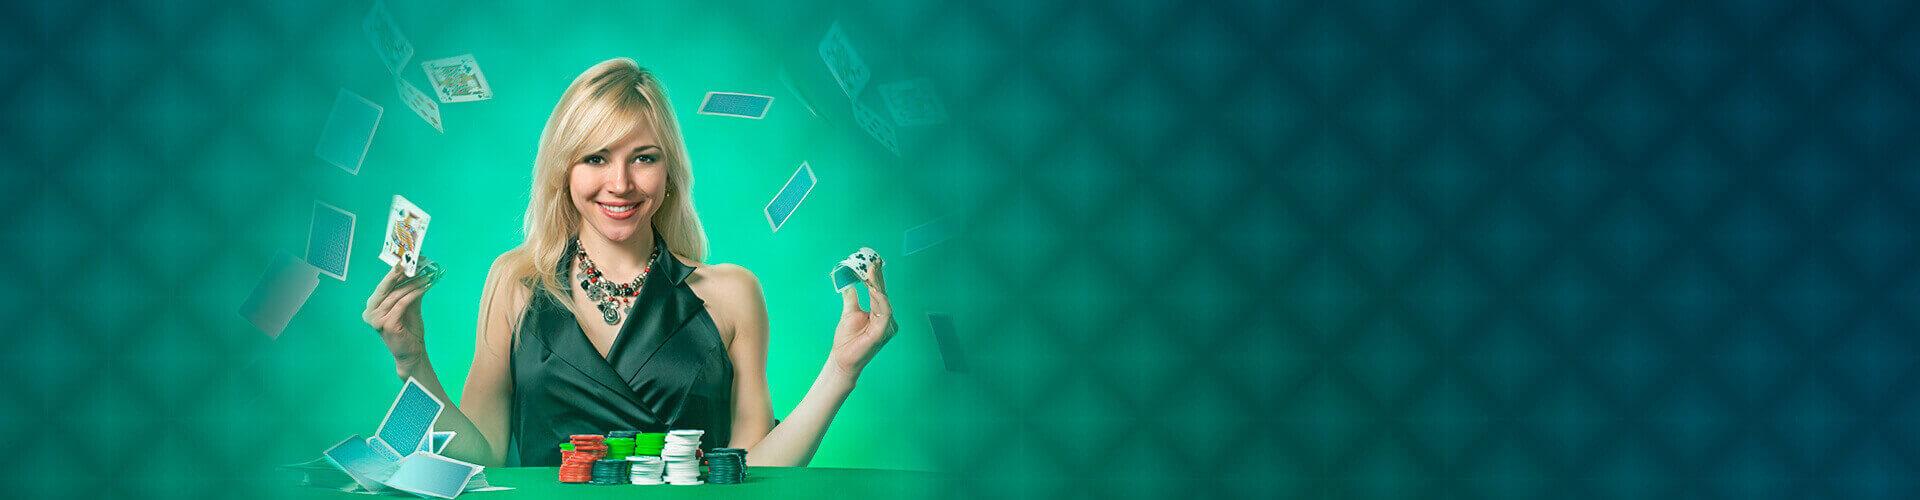 Mulher embaralhando cartas - woman throwing cards